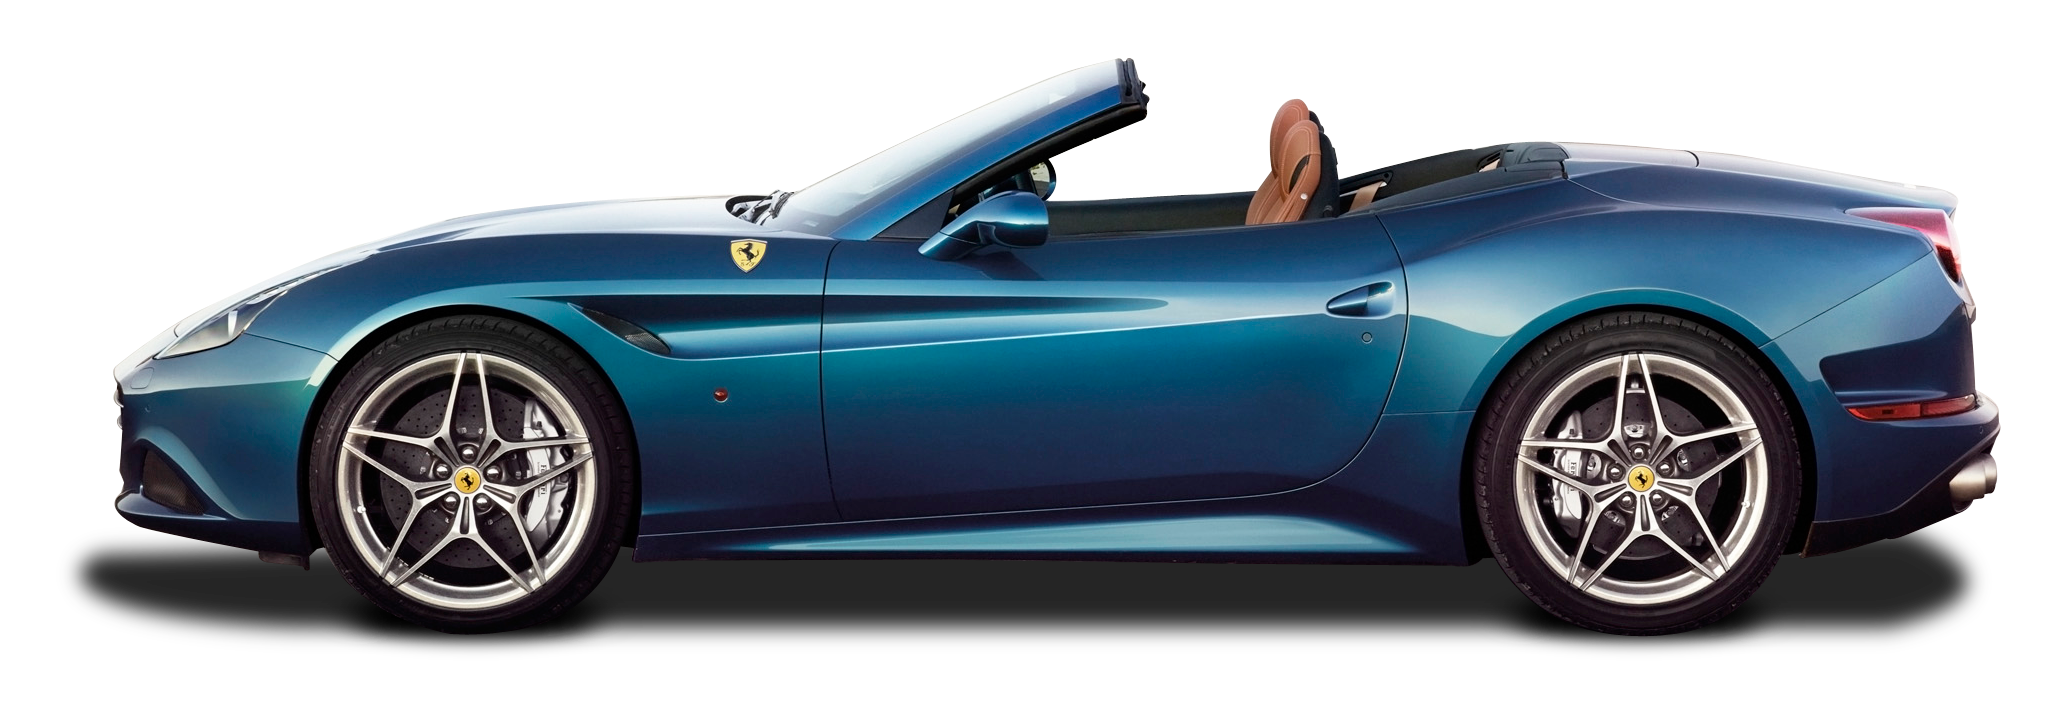 Blue Ferrari California T Car